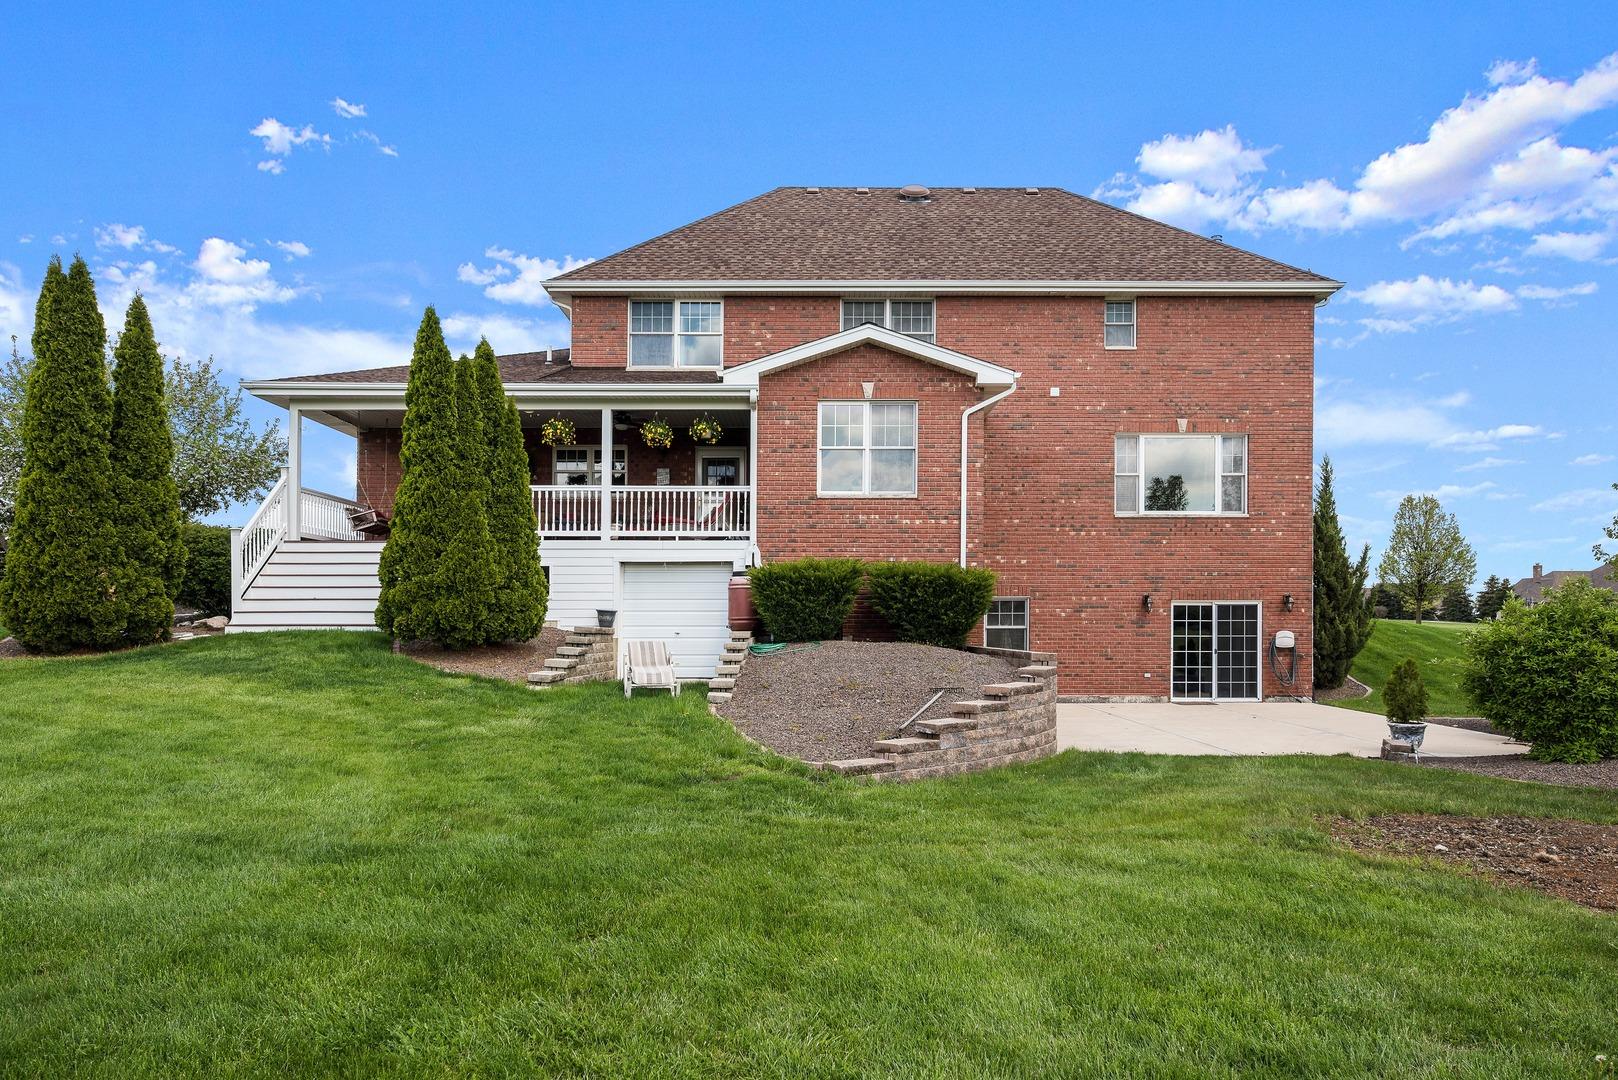 8701 West Blackthorne, FRANKFORT, Illinois, 60423